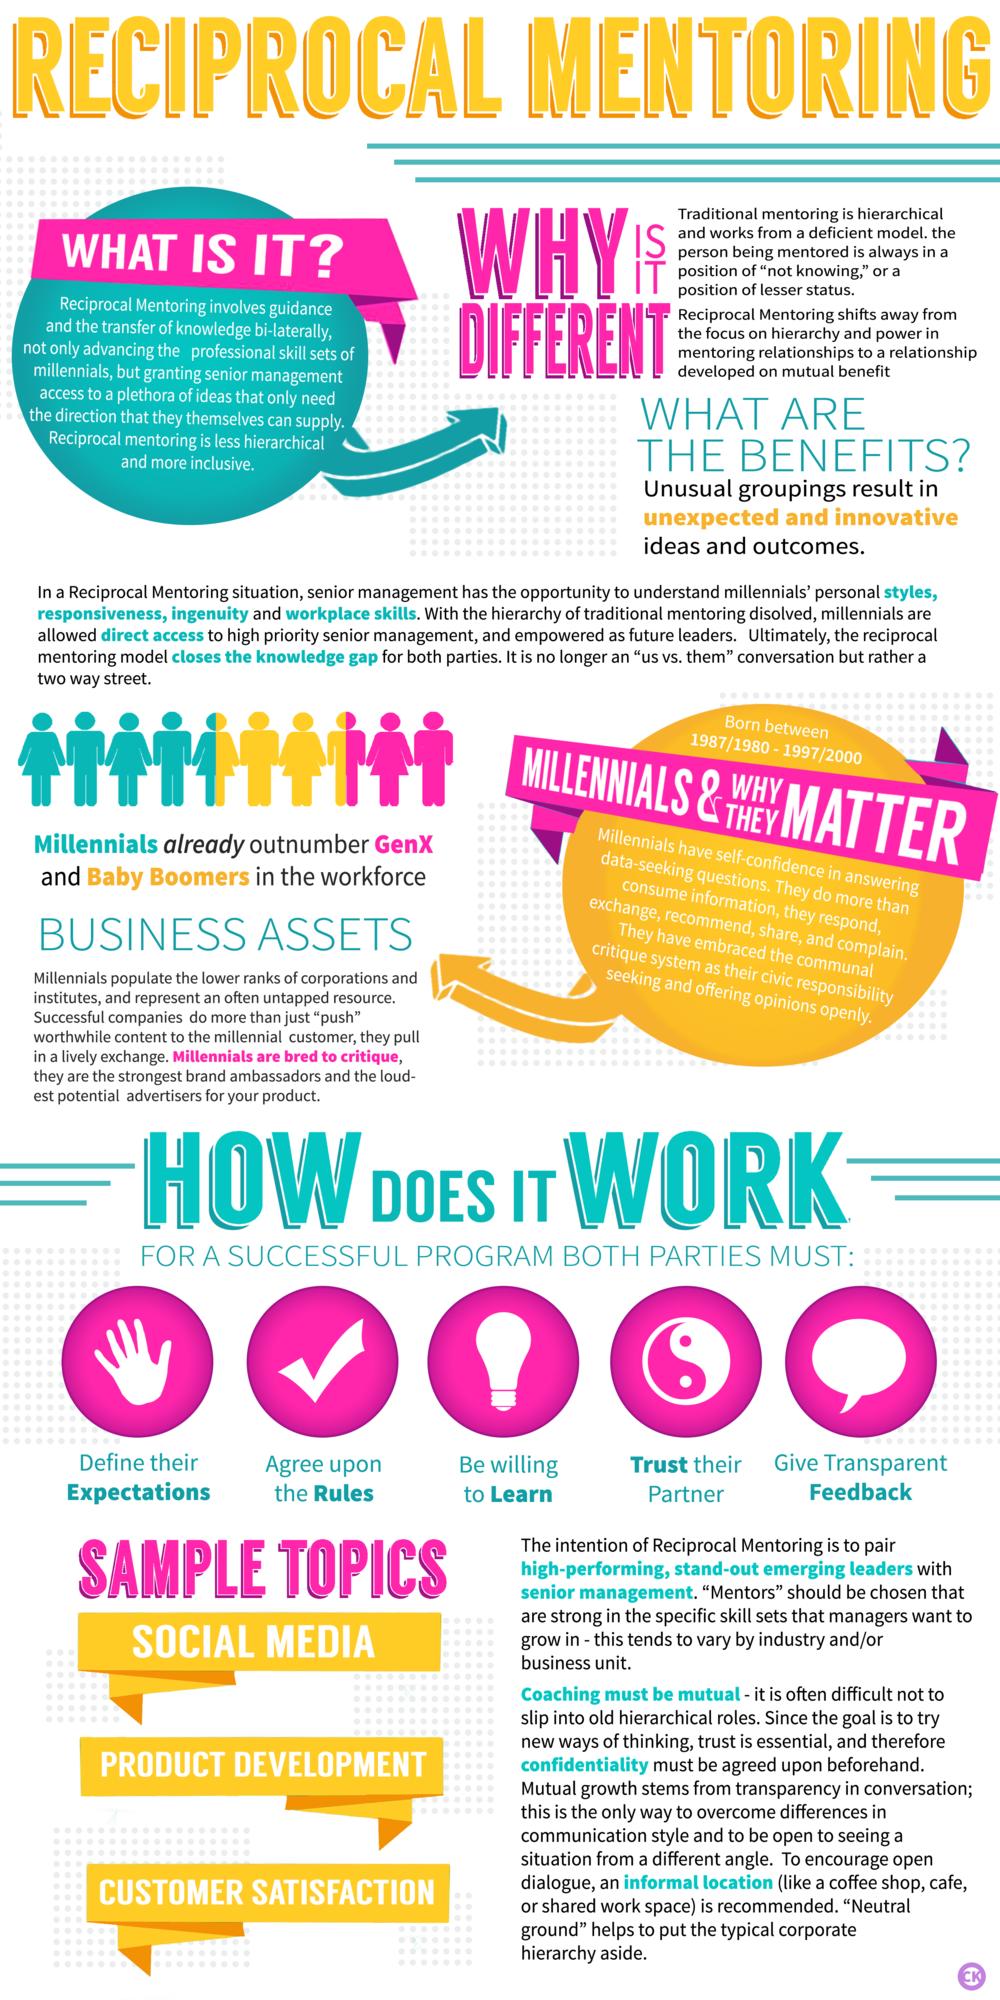 Reciprocal Mentoring Program Infographic Proposal Personal Proposal Infographic